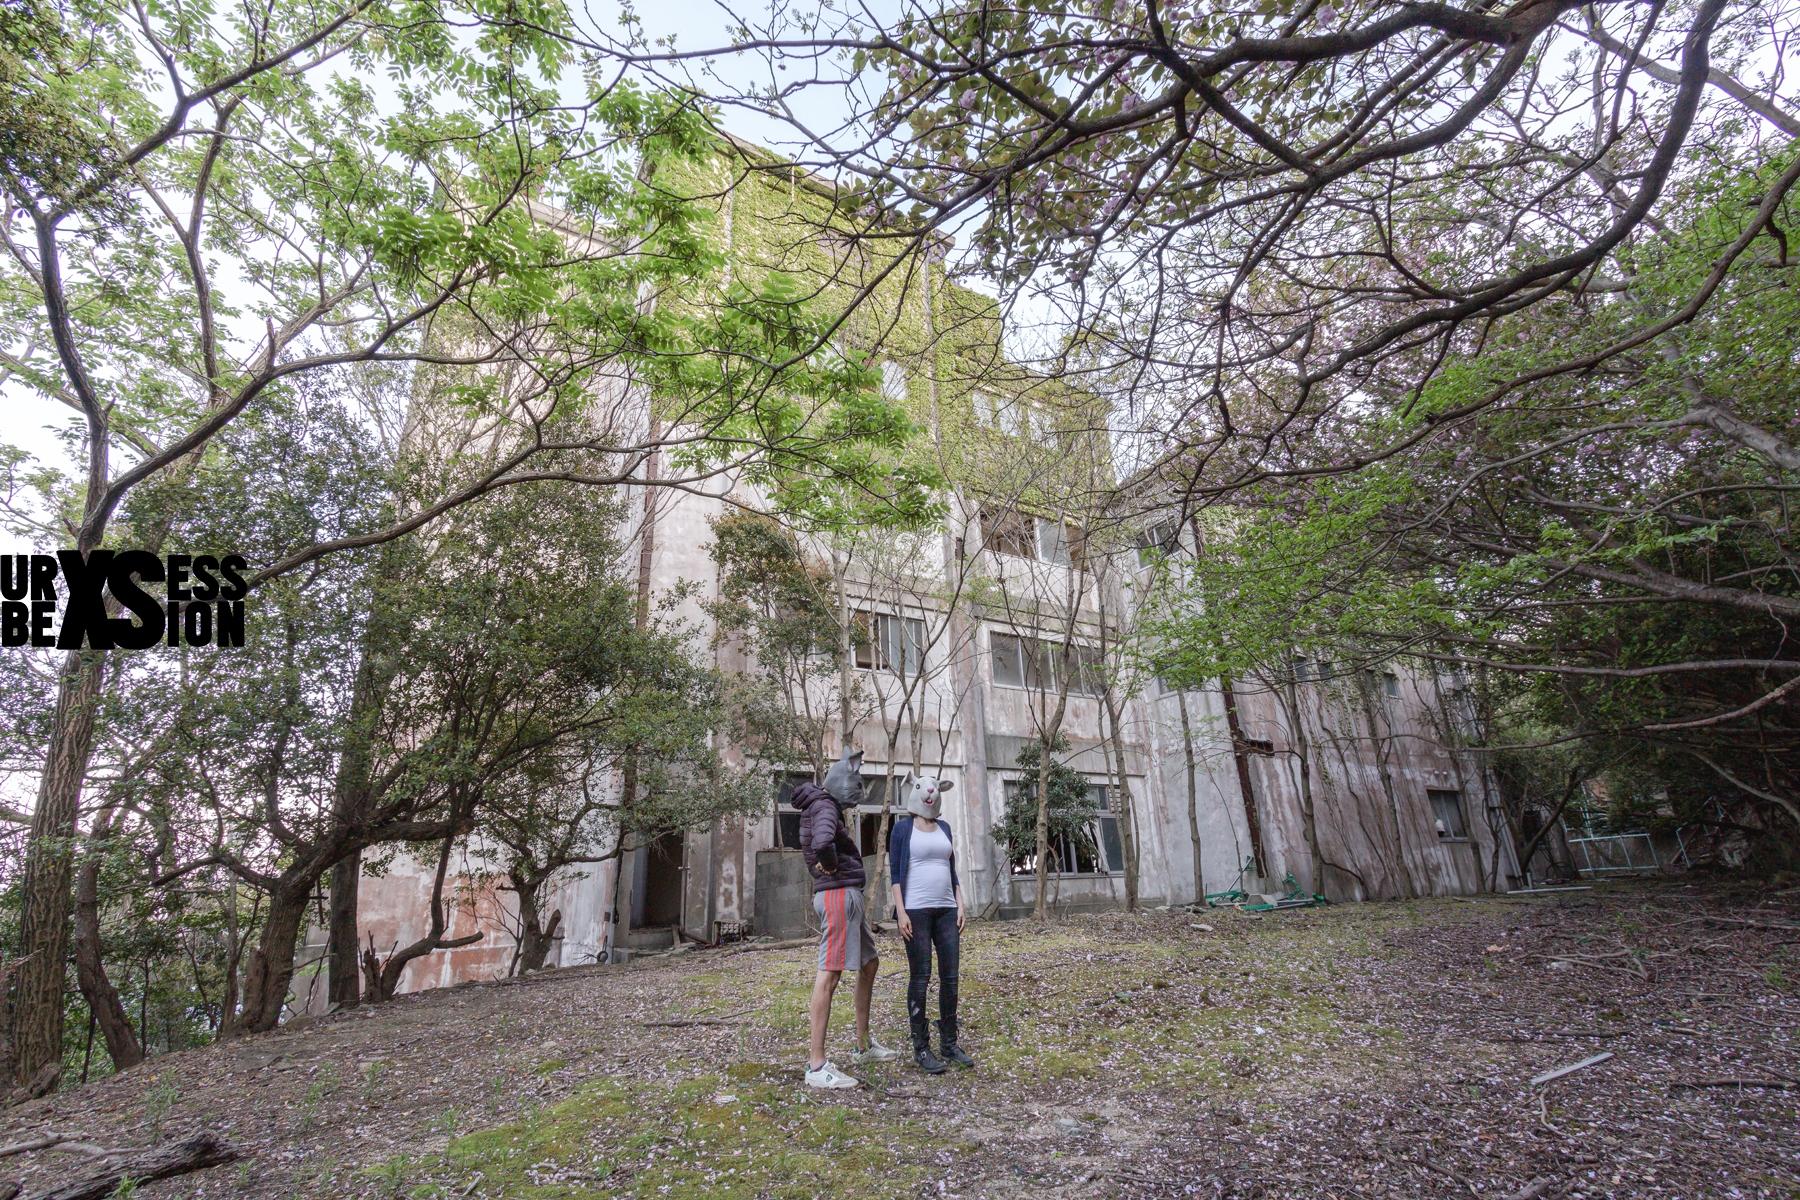 Hotel Kuroshio Inn - Hôtel abandonné au Japon